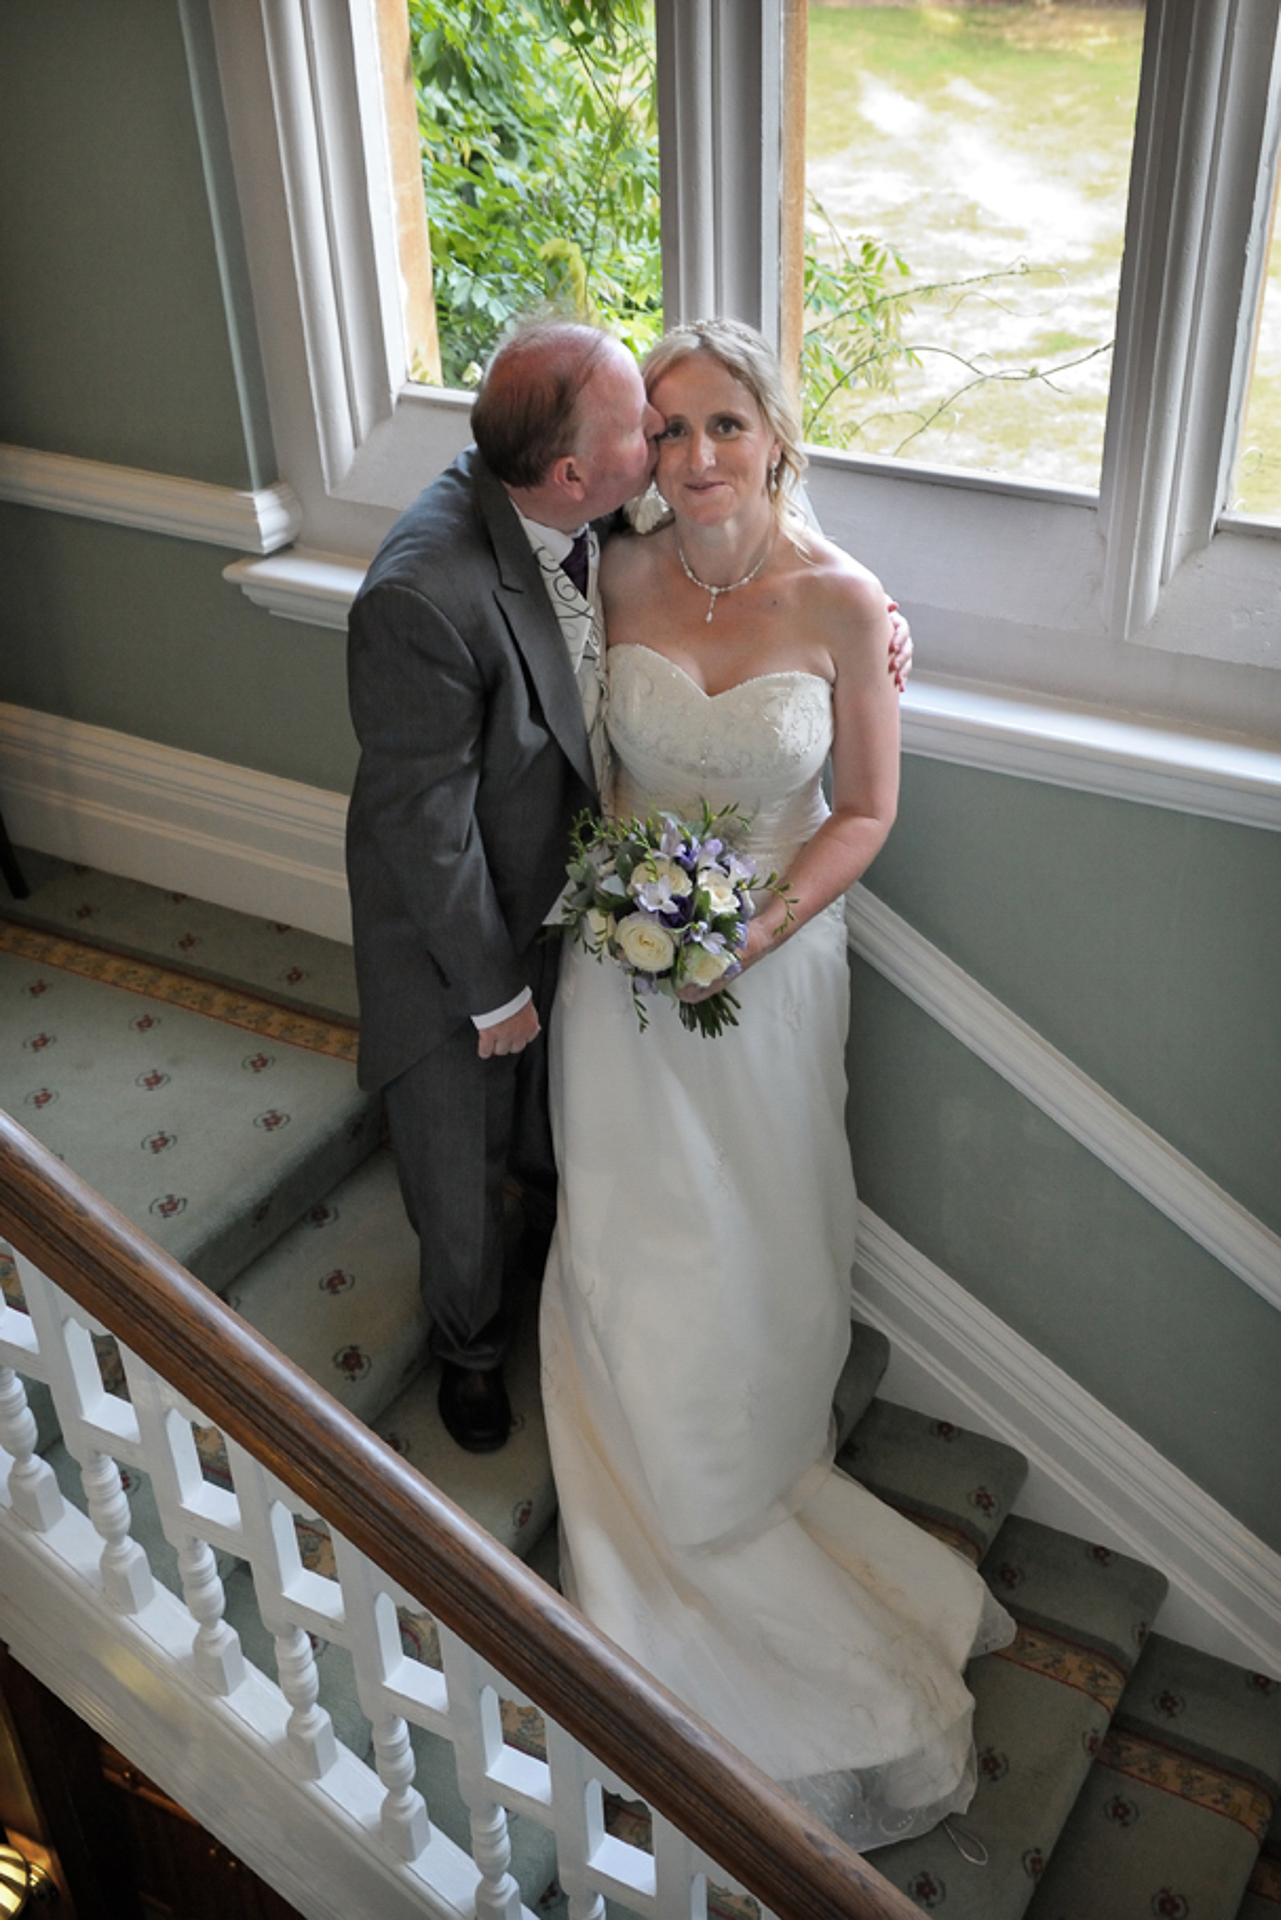 Cantley House Wedding photography_17.JPG